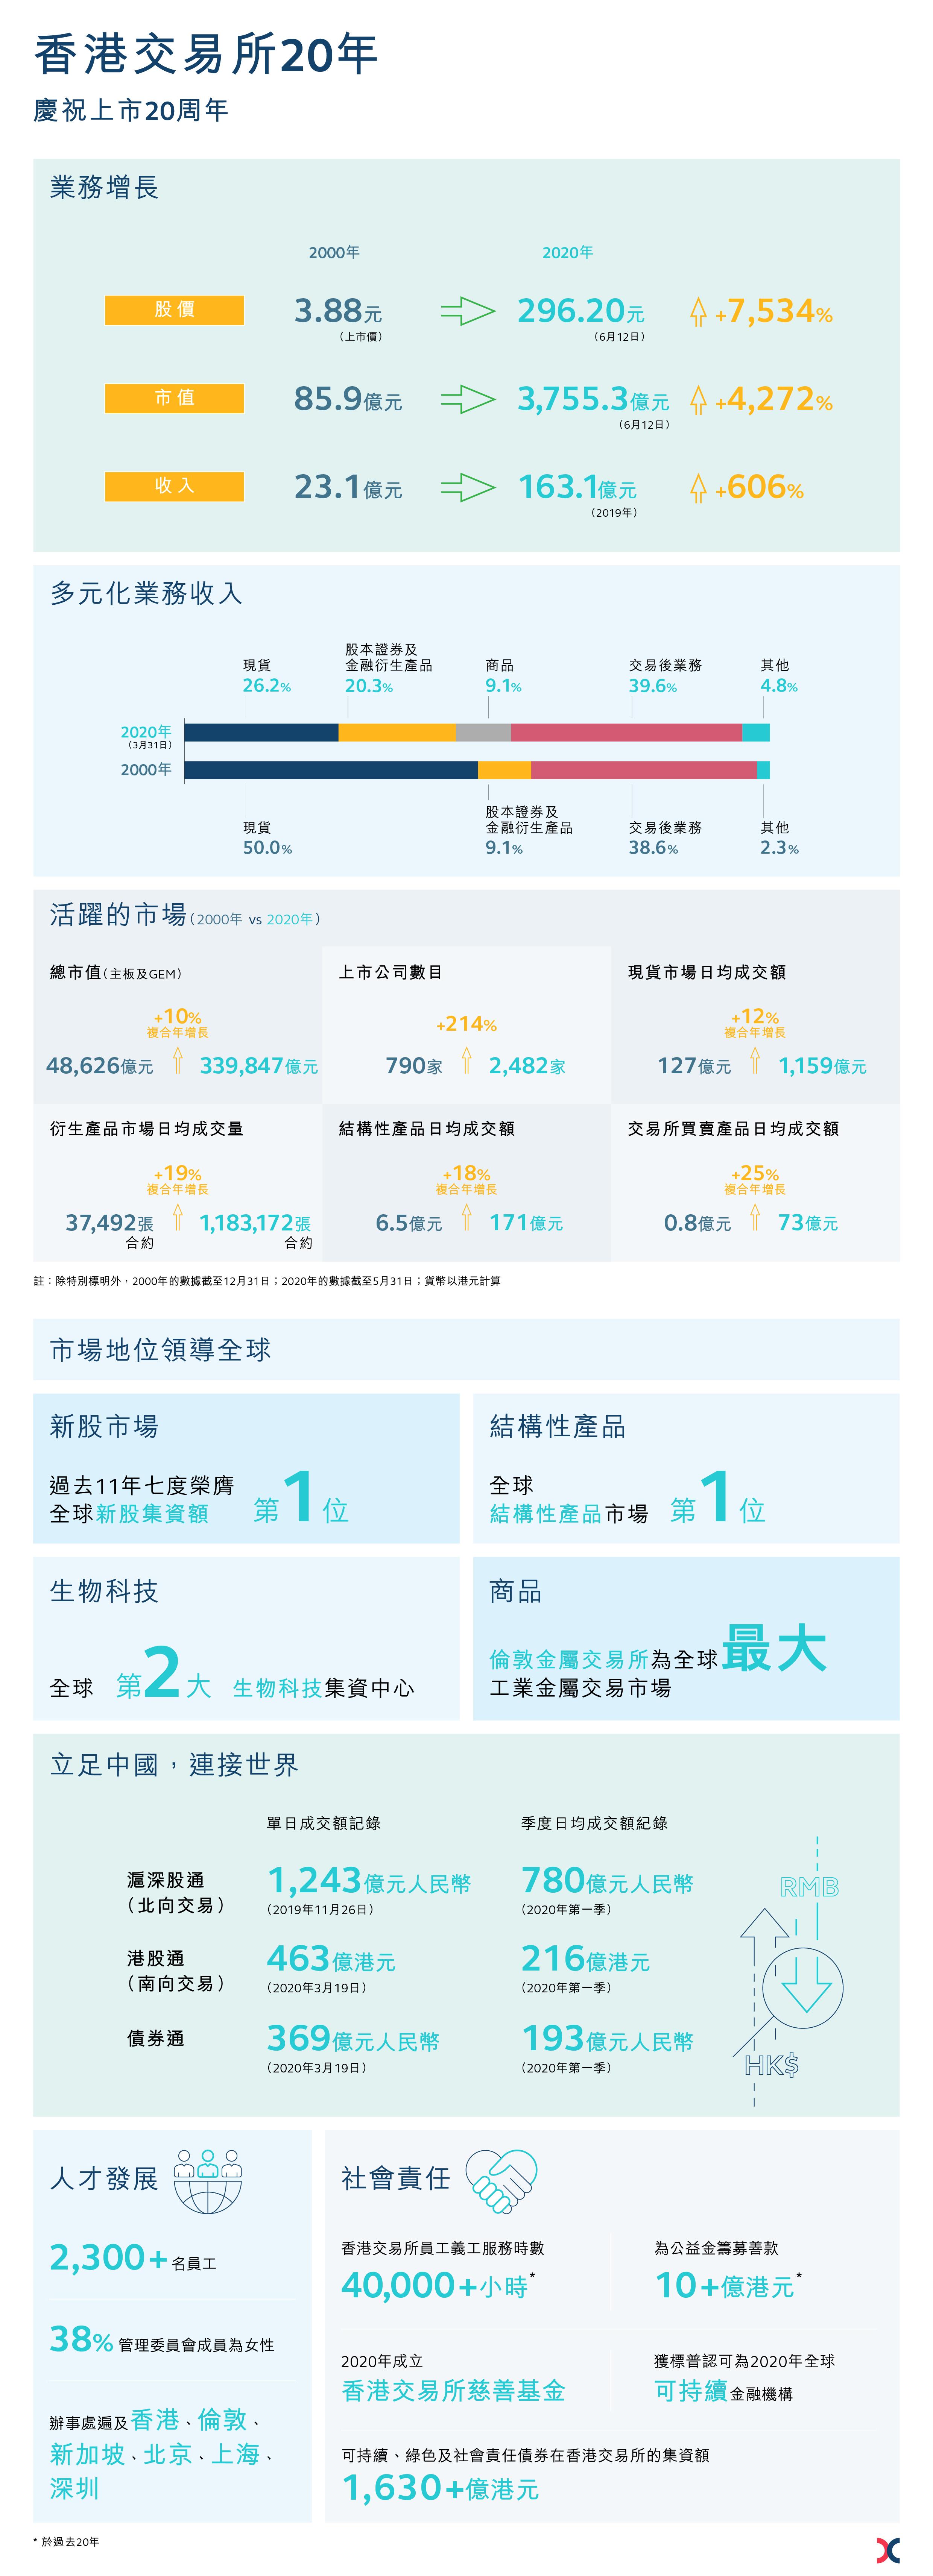 HKEx20 Years Factsheet_TC